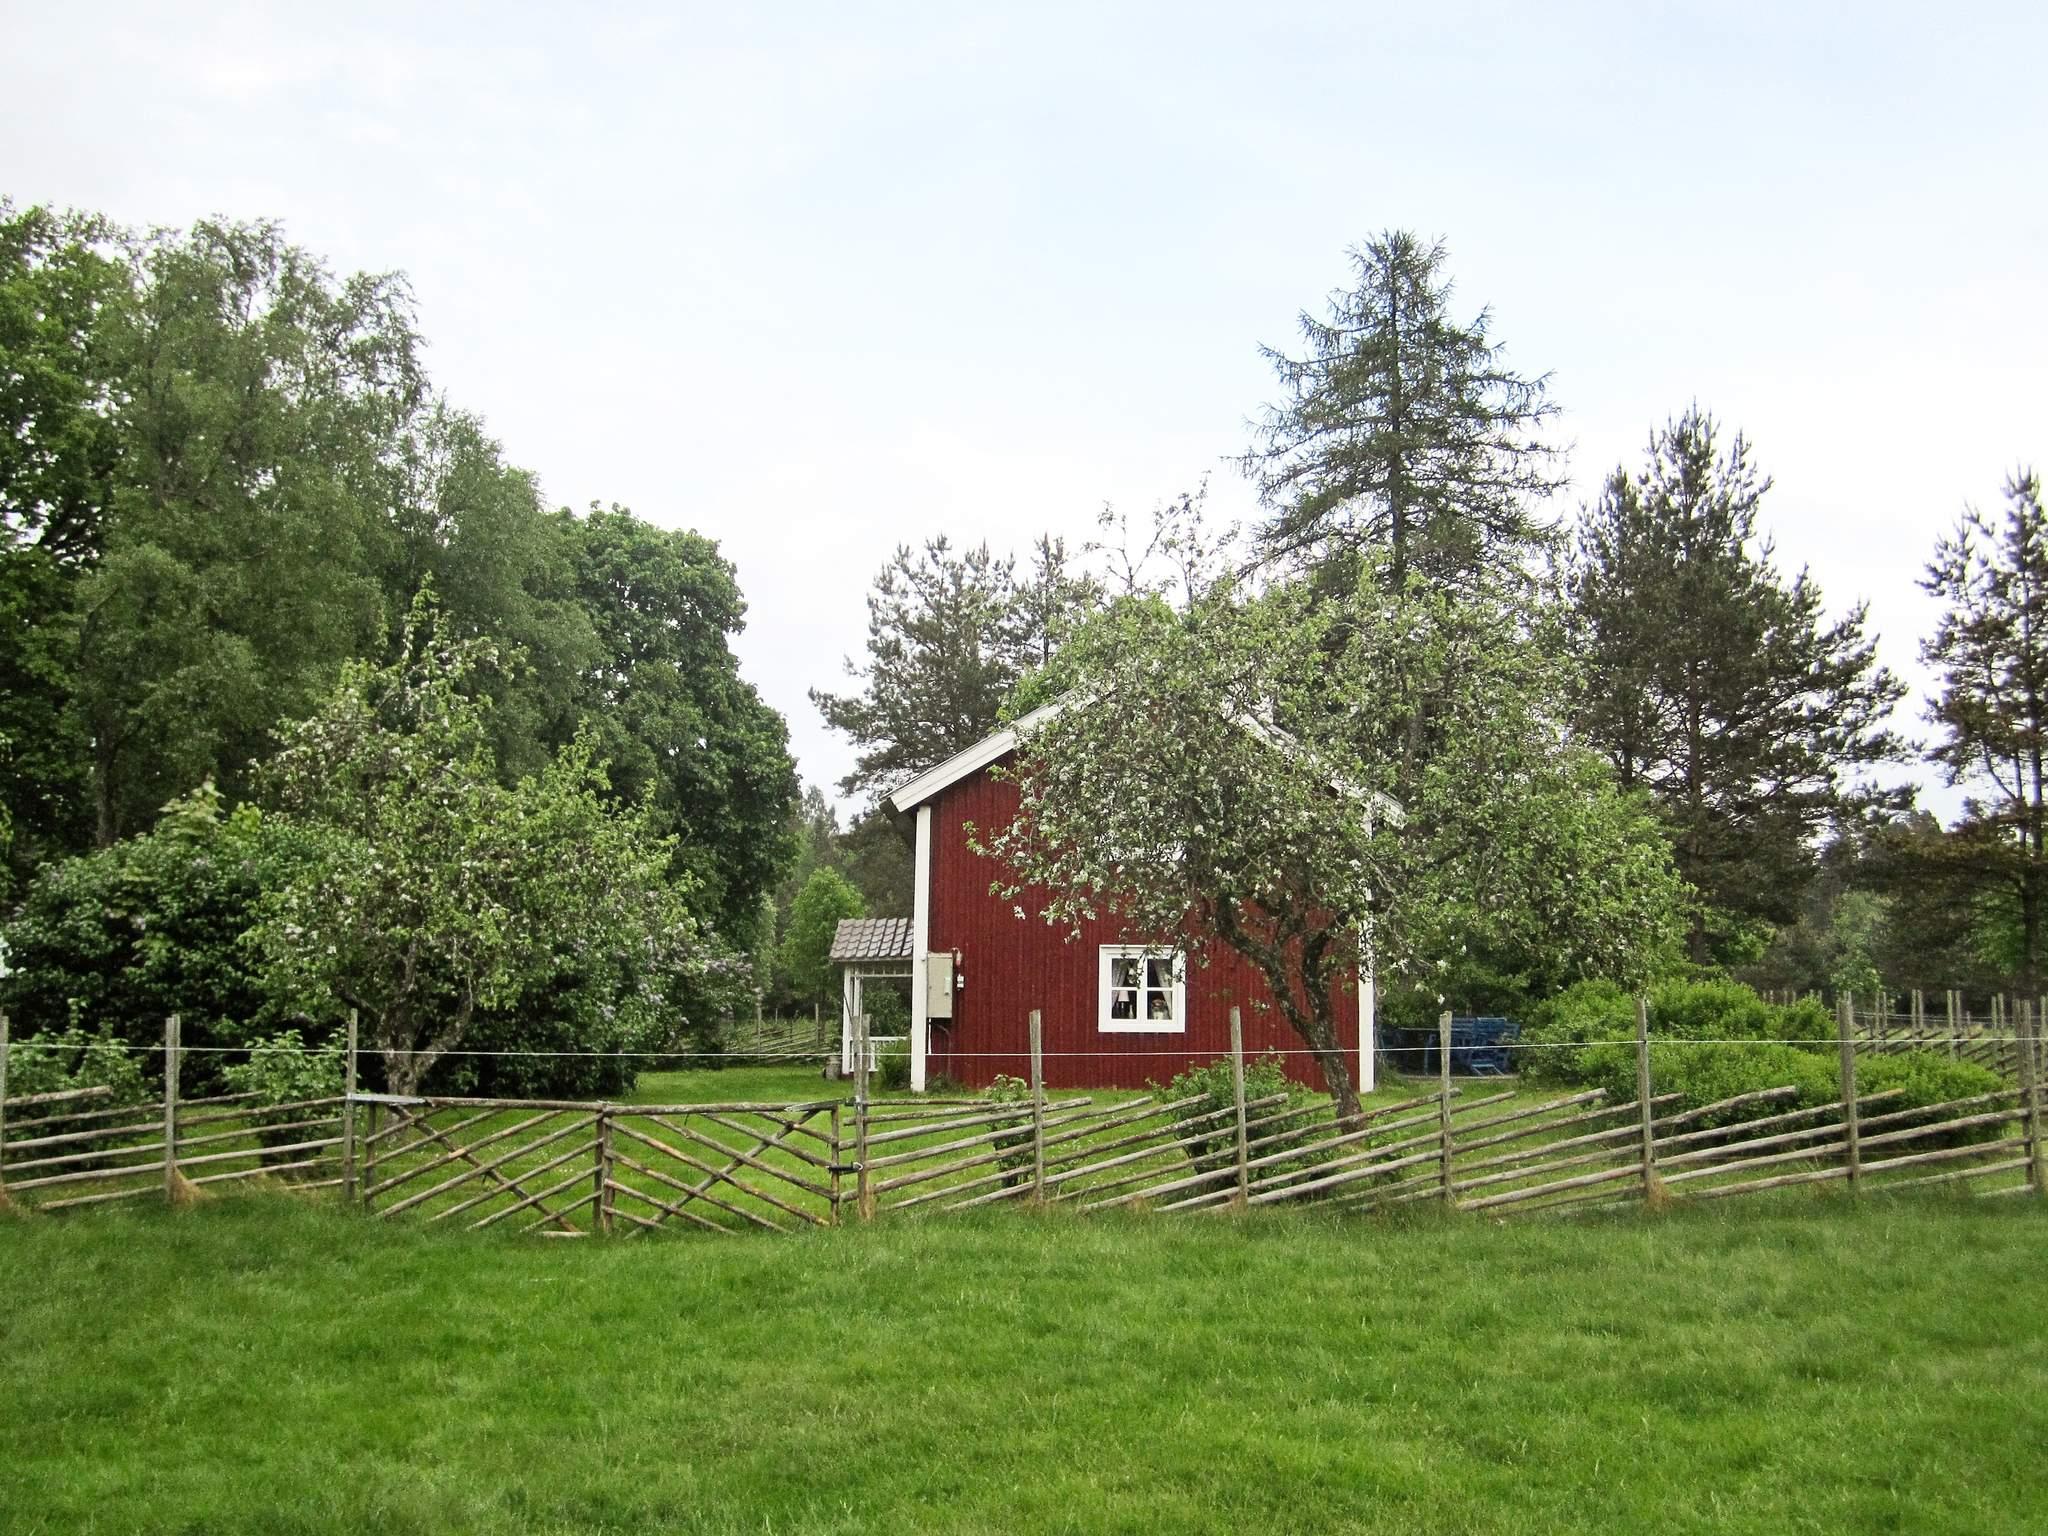 Ferienhaus Jönköping (180116), Jönköping, Jönköpings län, Südschweden, Schweden, Bild 19